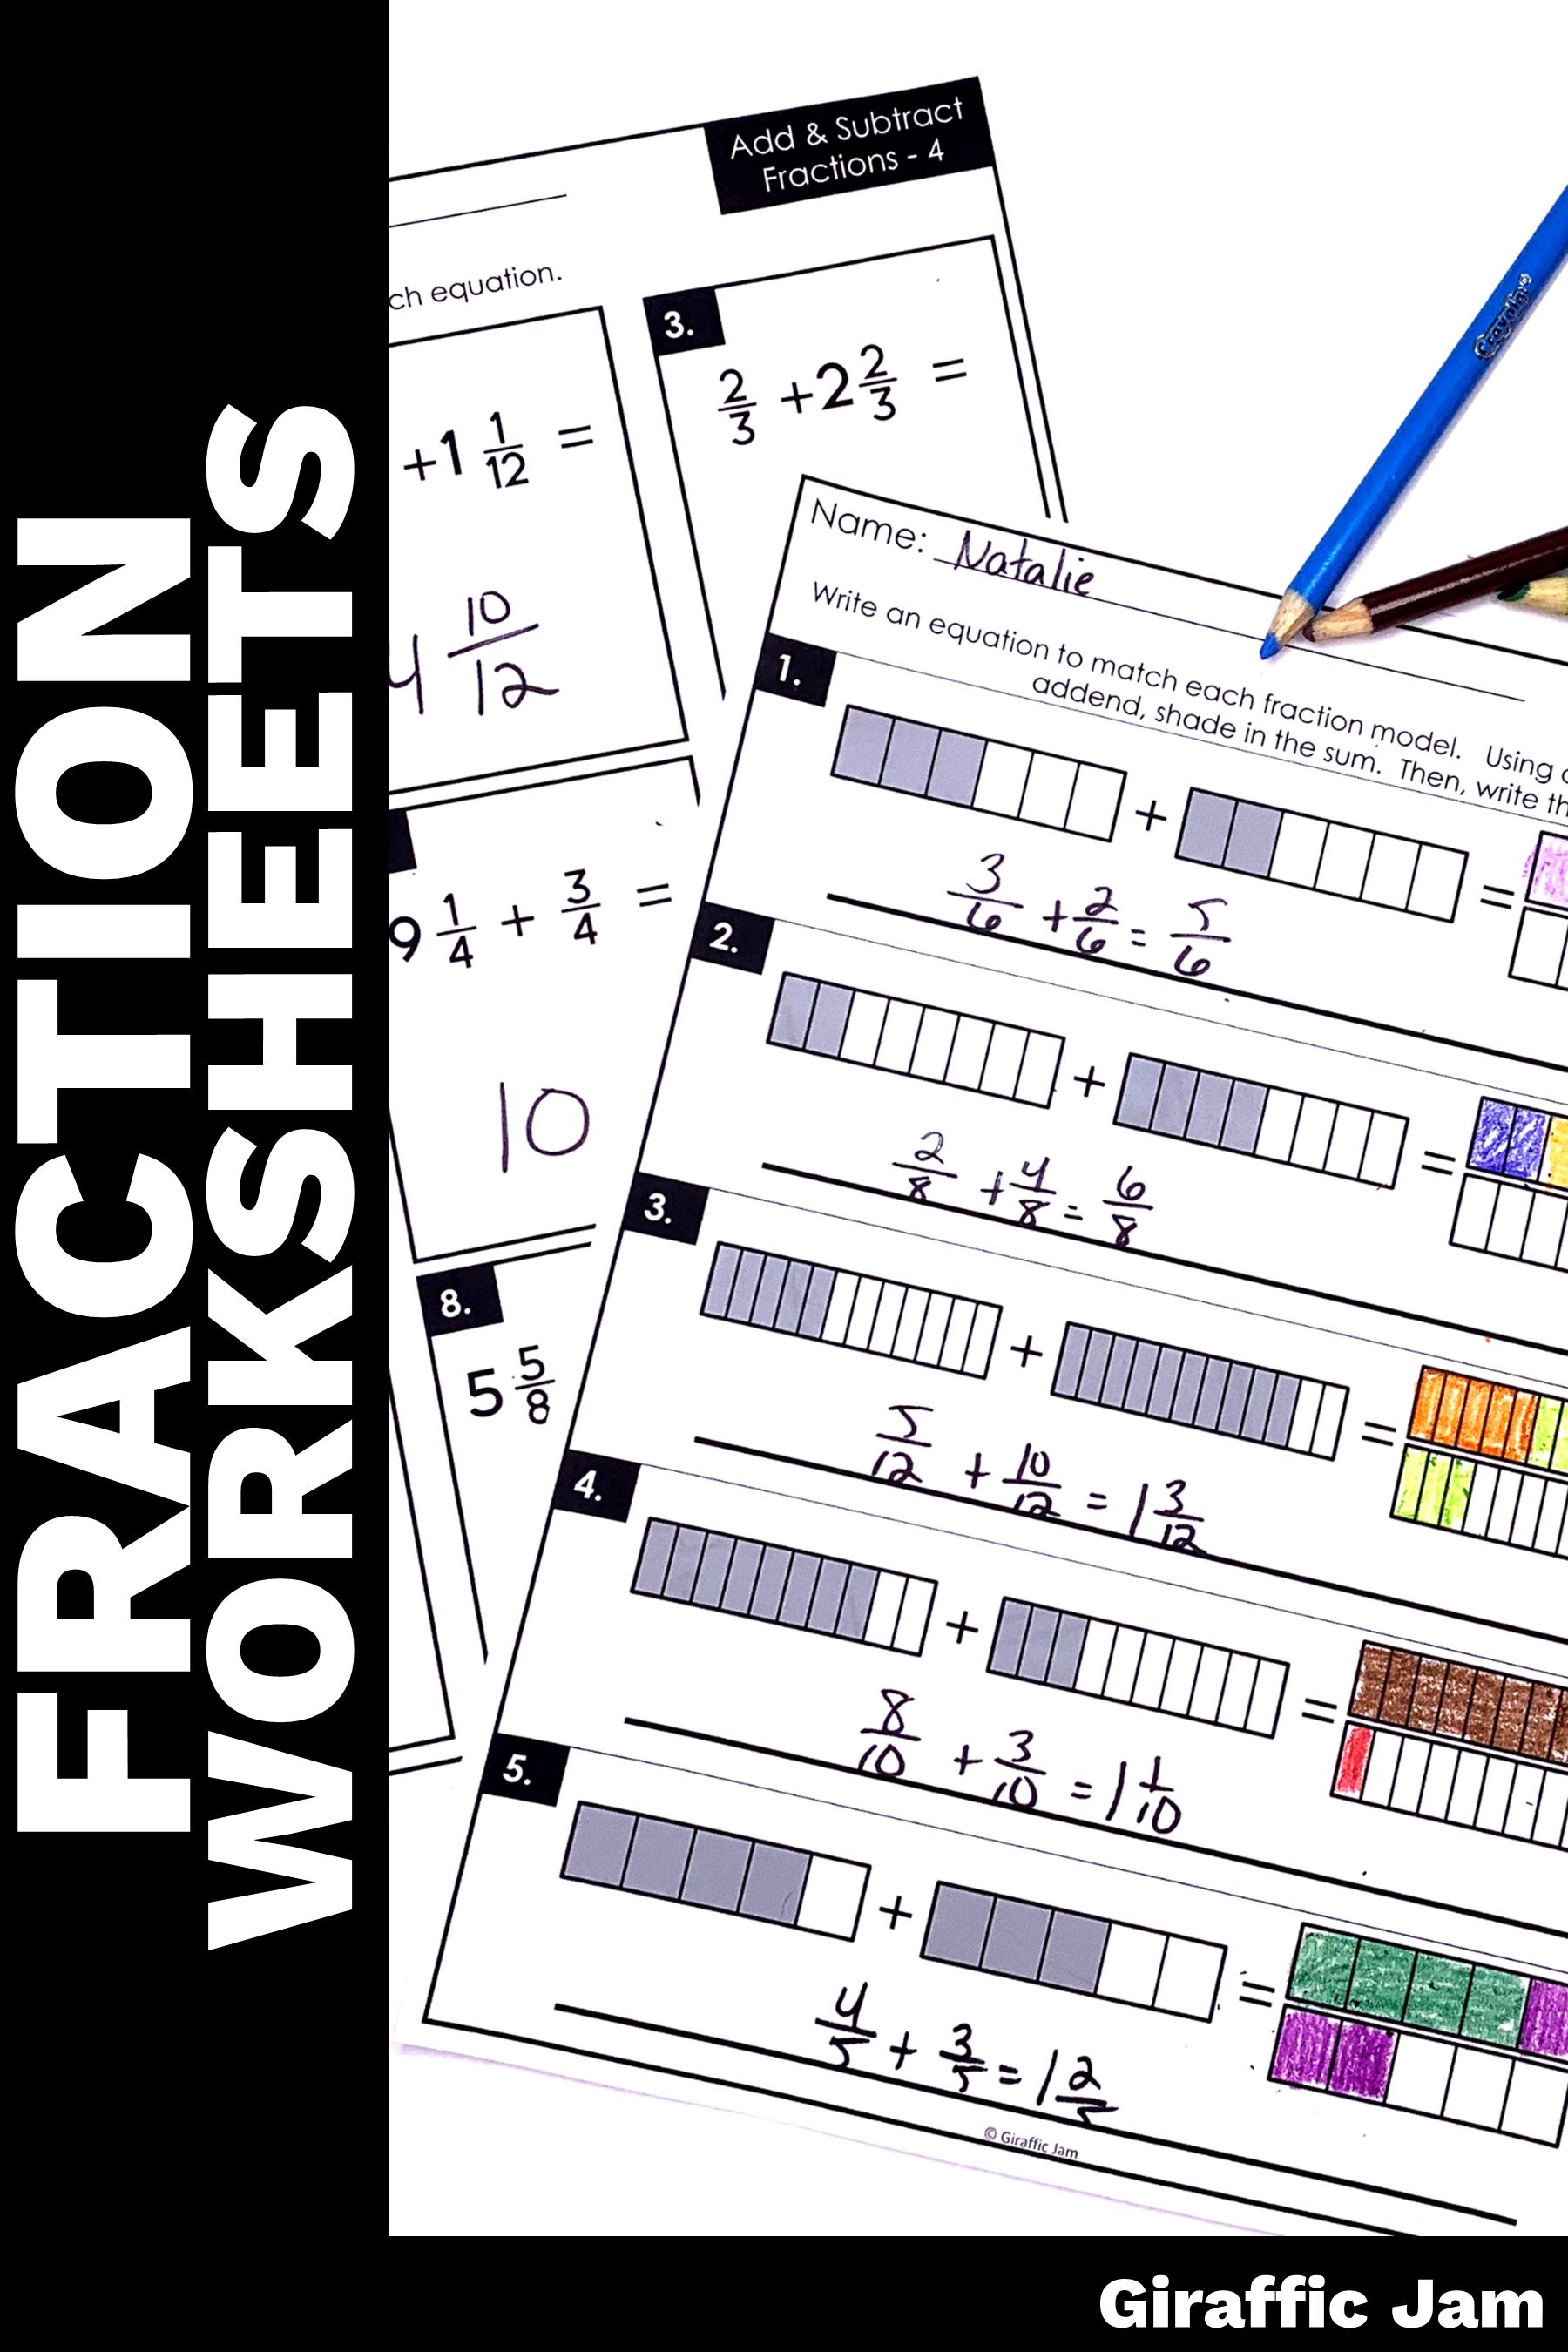 medium resolution of Adding and Subtracting Fractions Worksheets   Fraction Homework   Fractions  worksheets